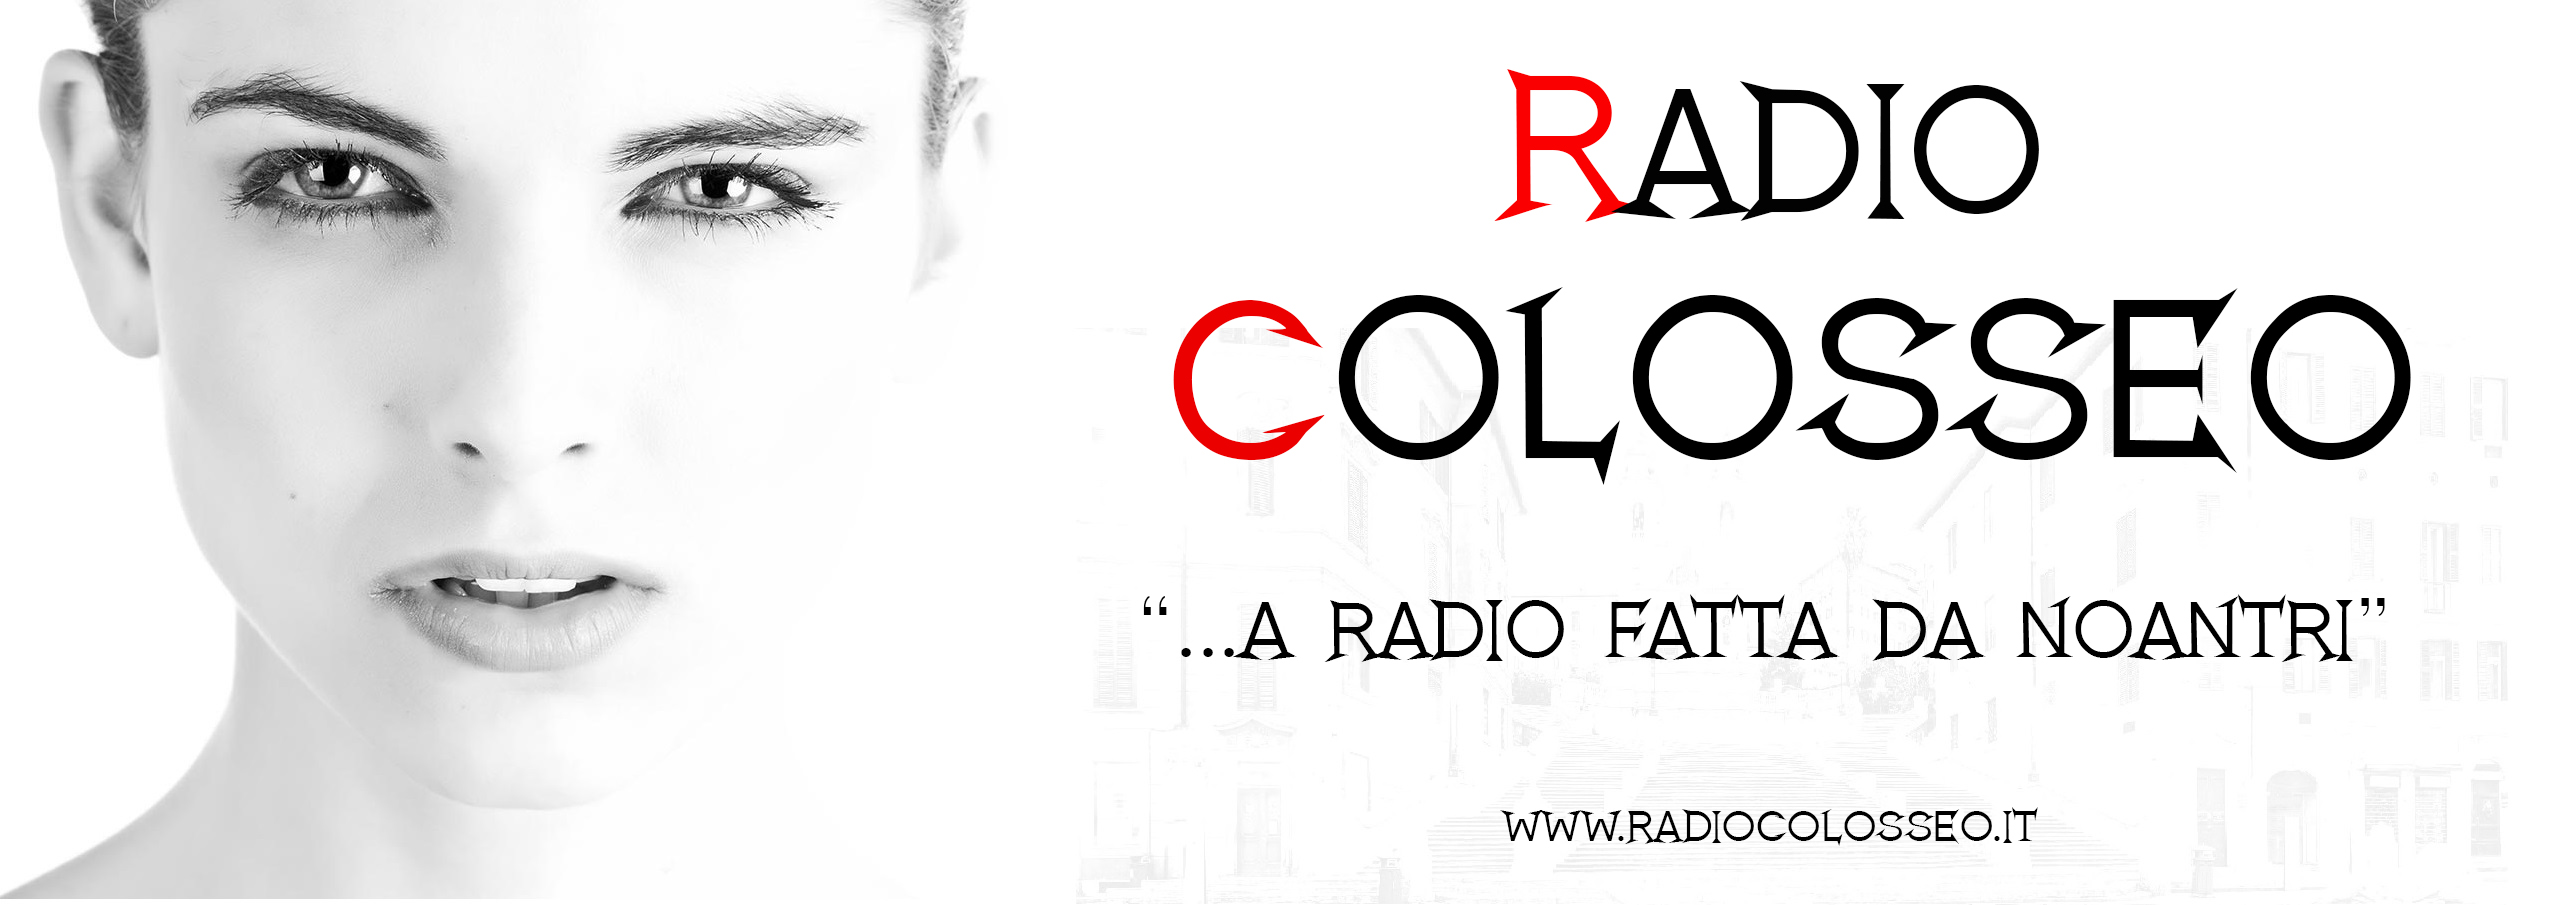 banner RADIOCOLOSSEO